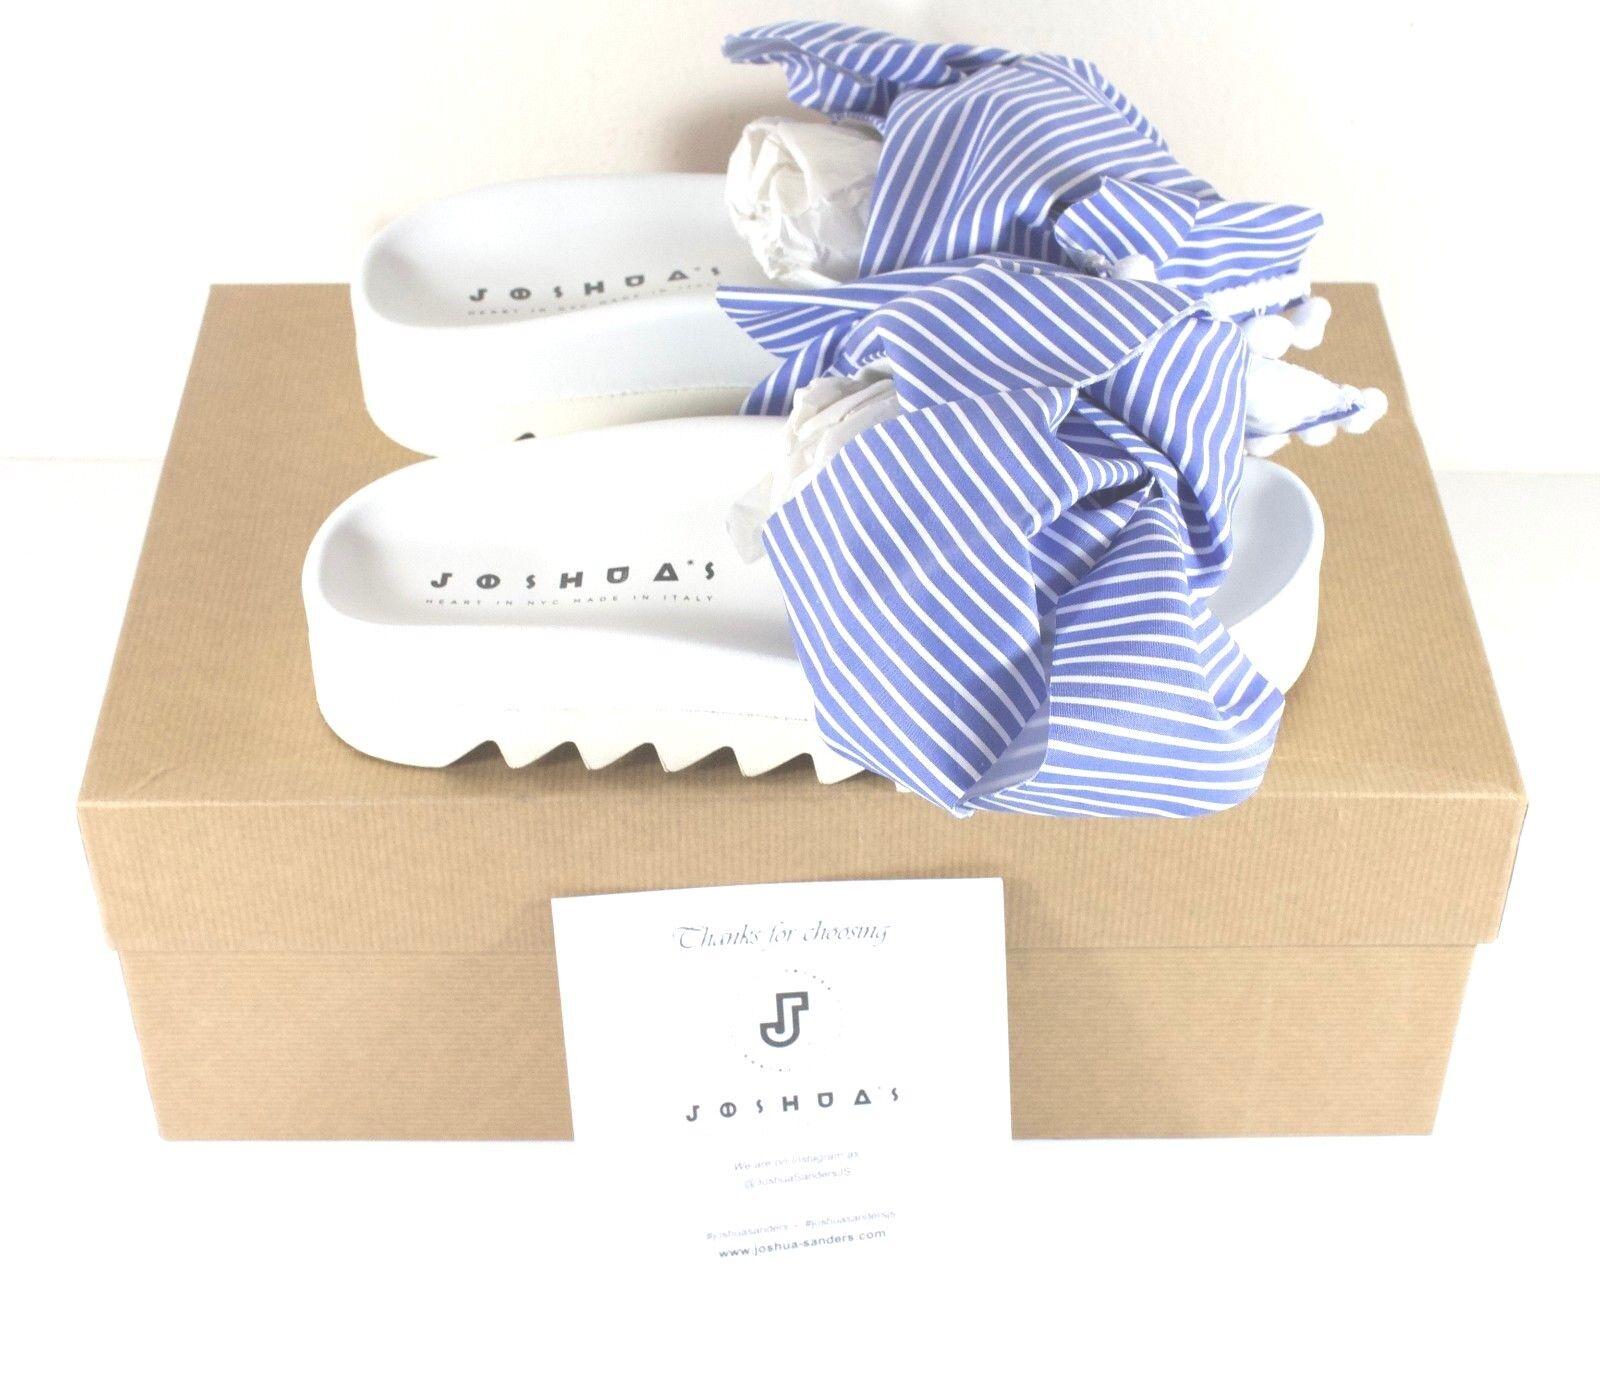 Joshua Sanders Wide Stripes Platform Bow Sandals bluee White Womens Size 37 US 7